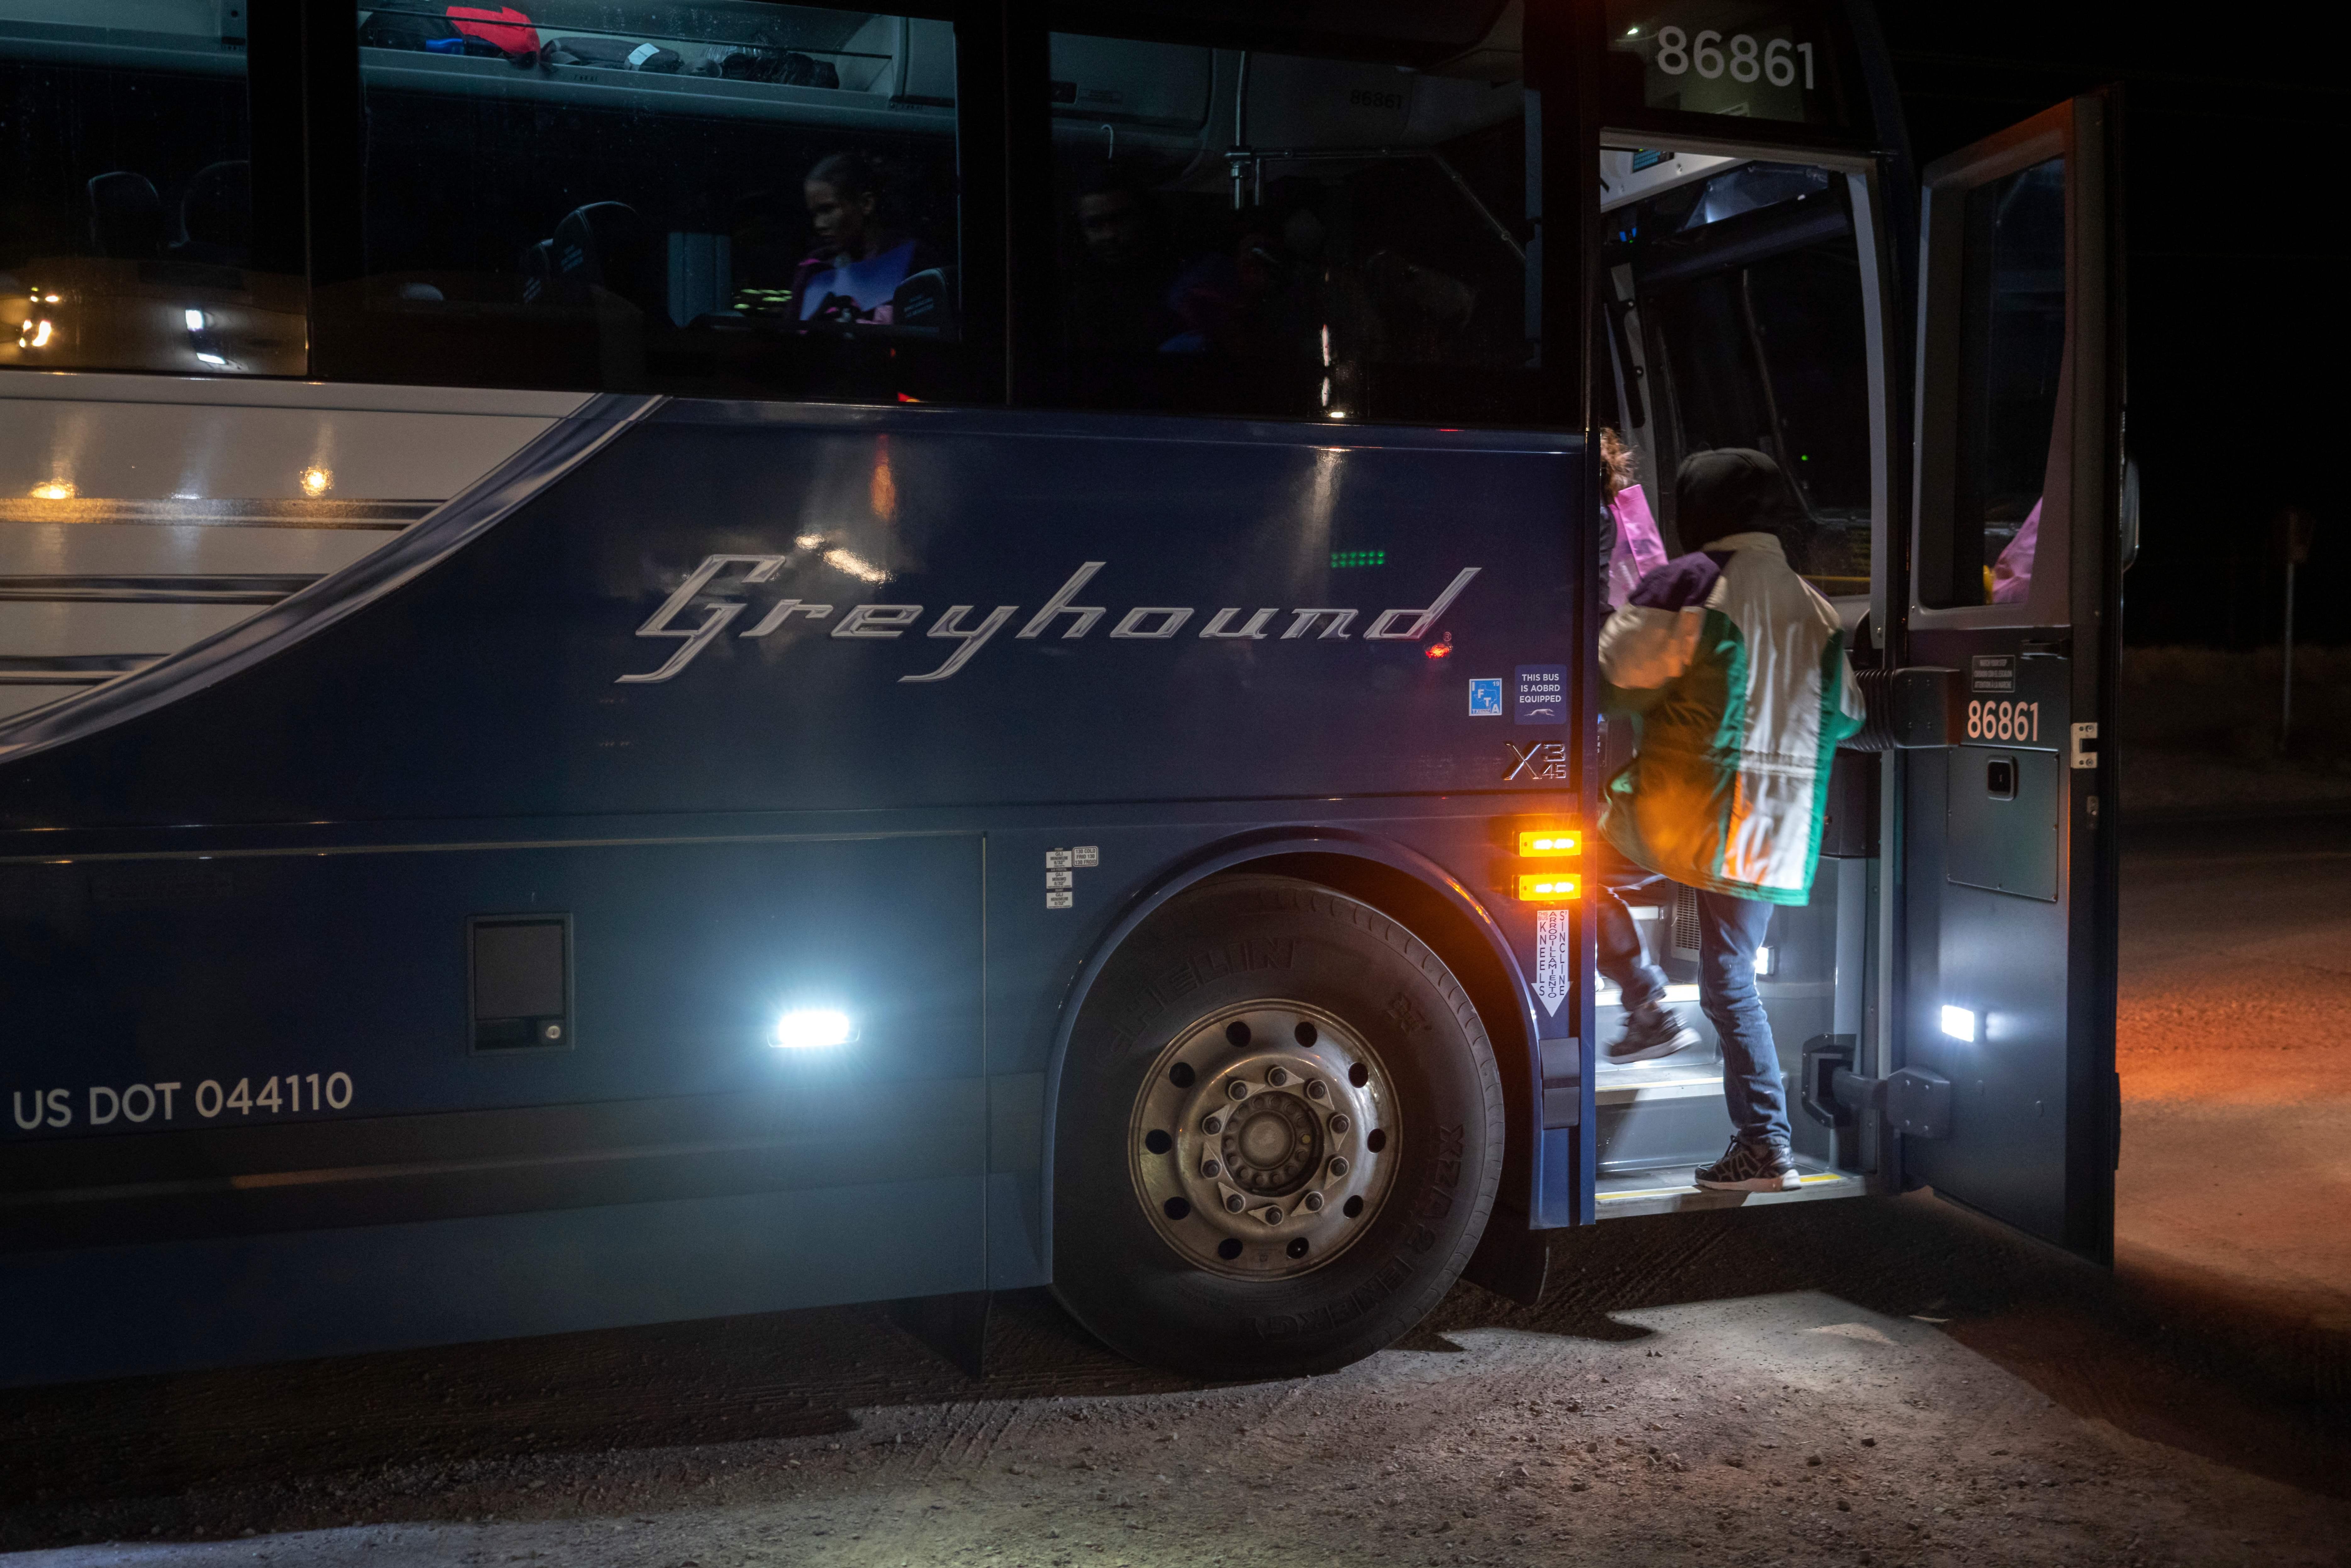 Passengers board a Greyhound bus on Jan. 3, 2019.